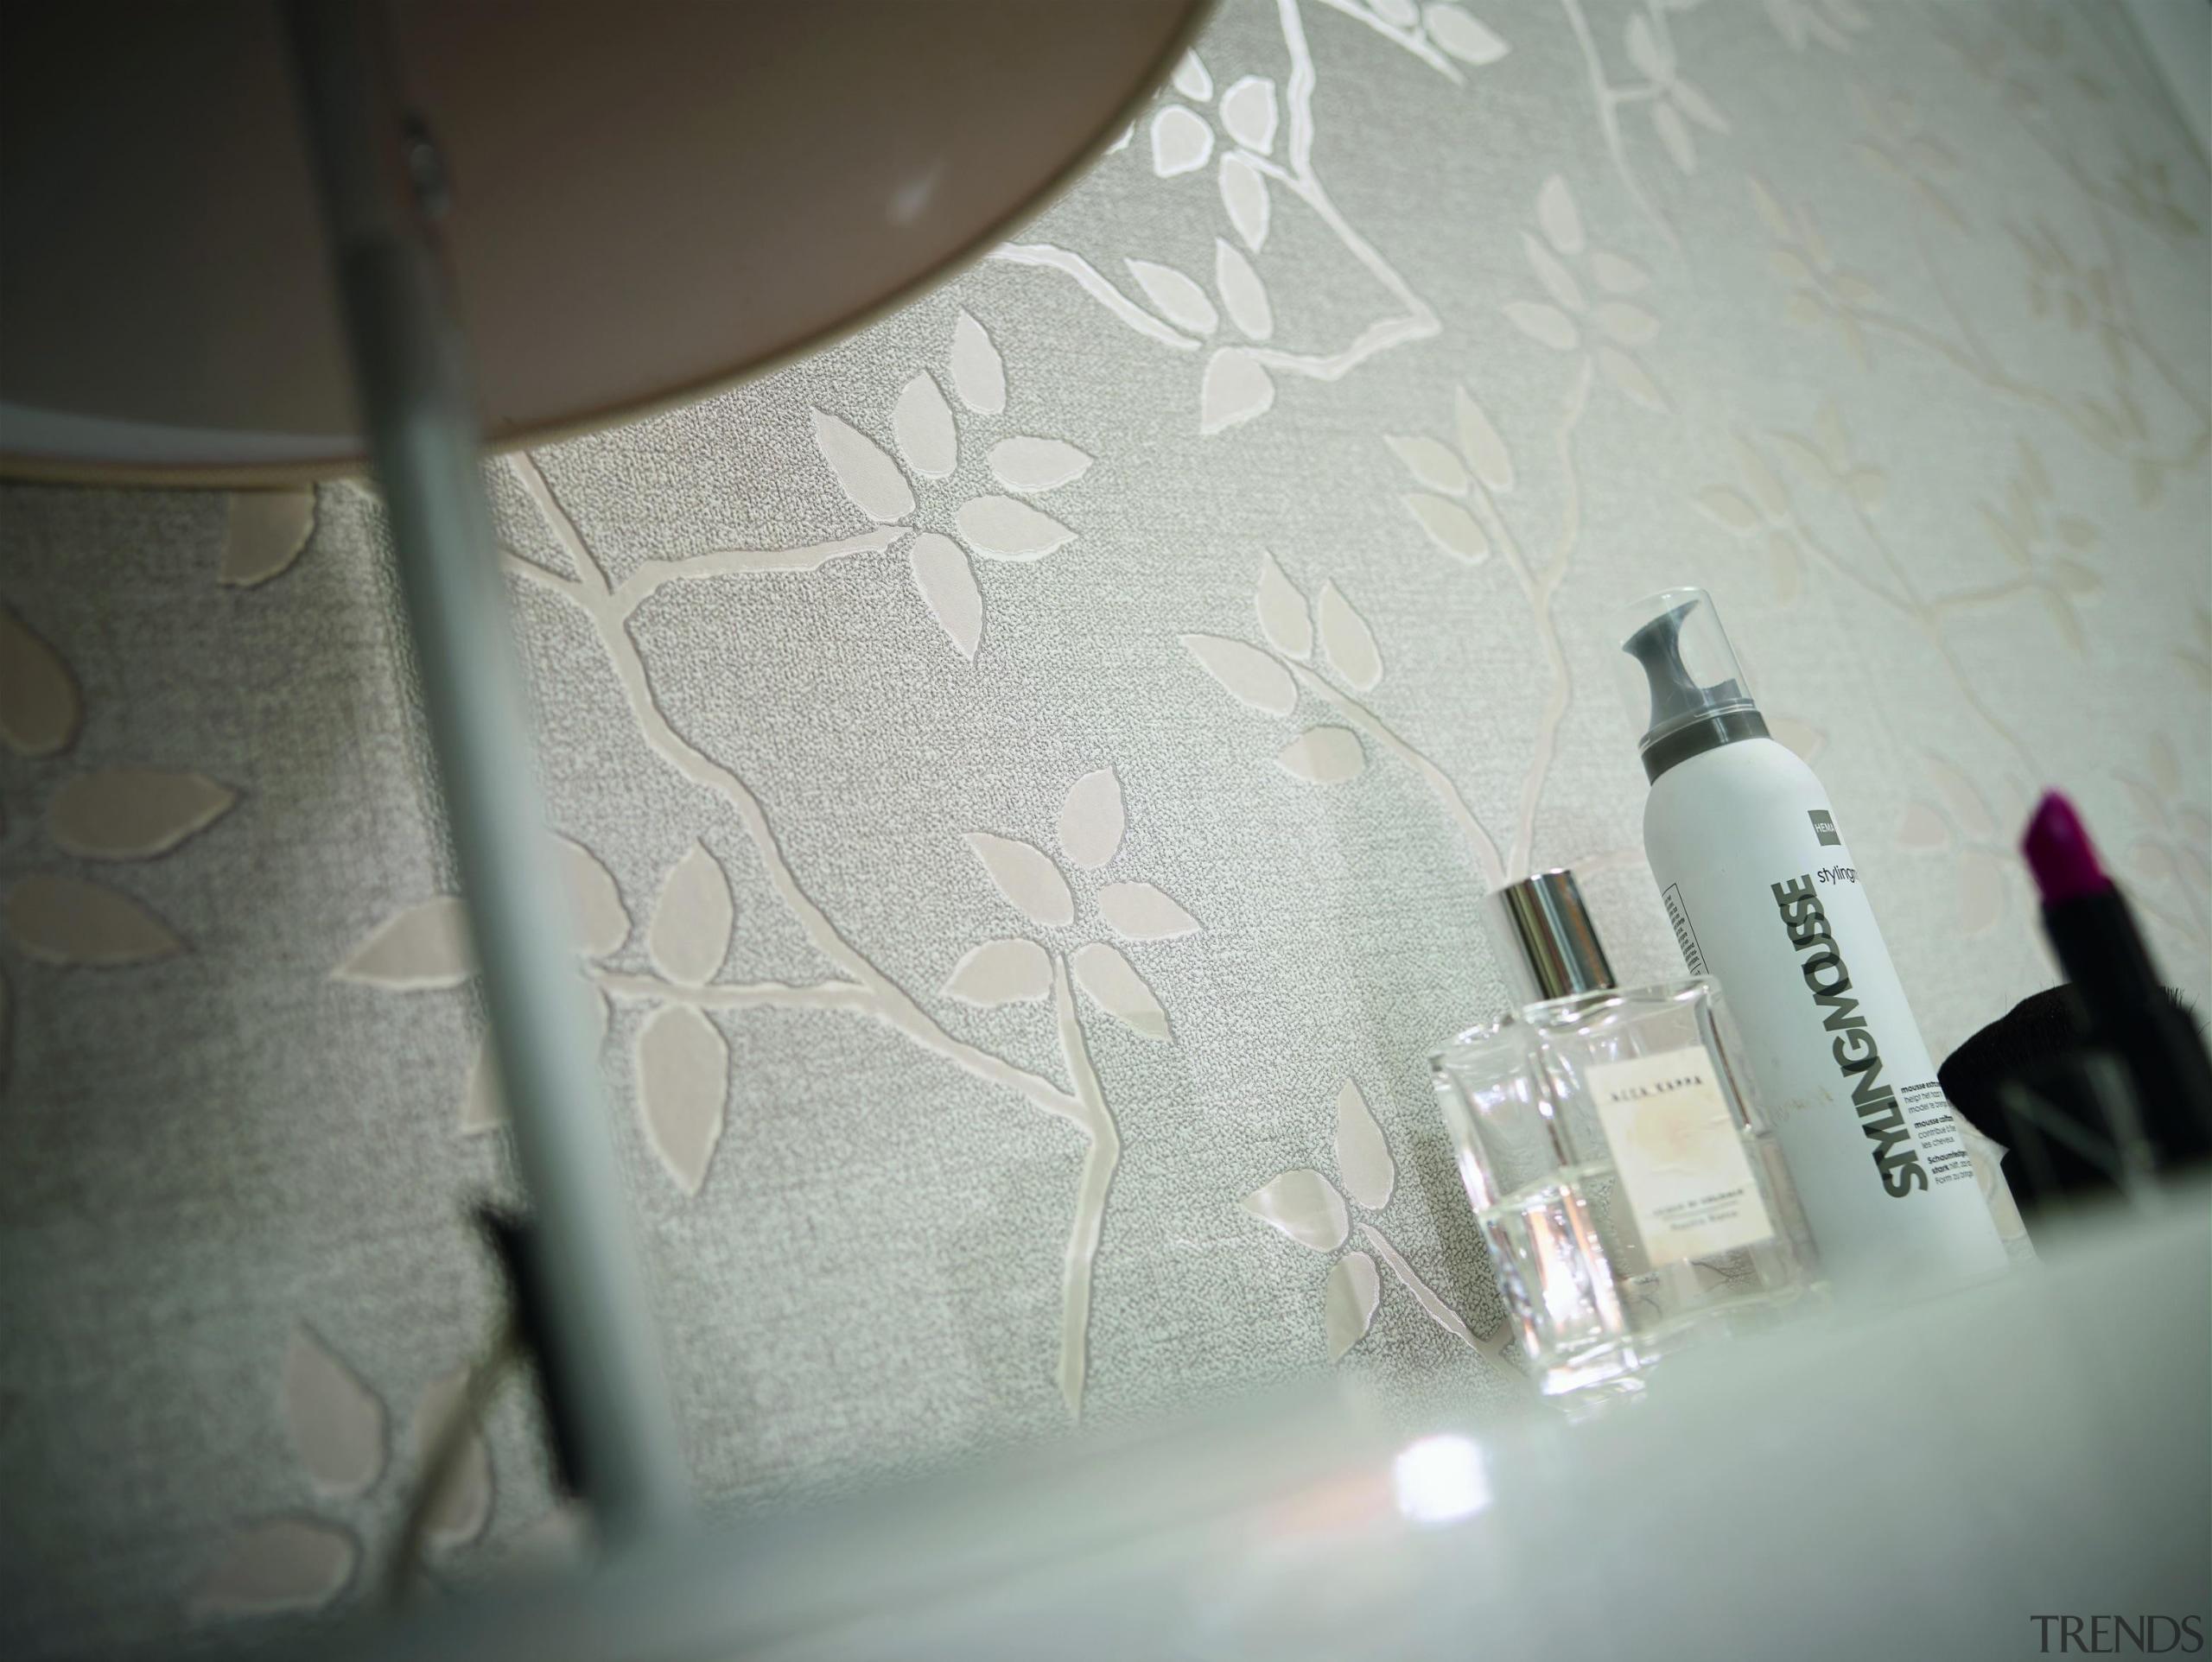 Elegance II Range - Elegance II Range - ceiling, design, glass, interior design, light, wall, gray